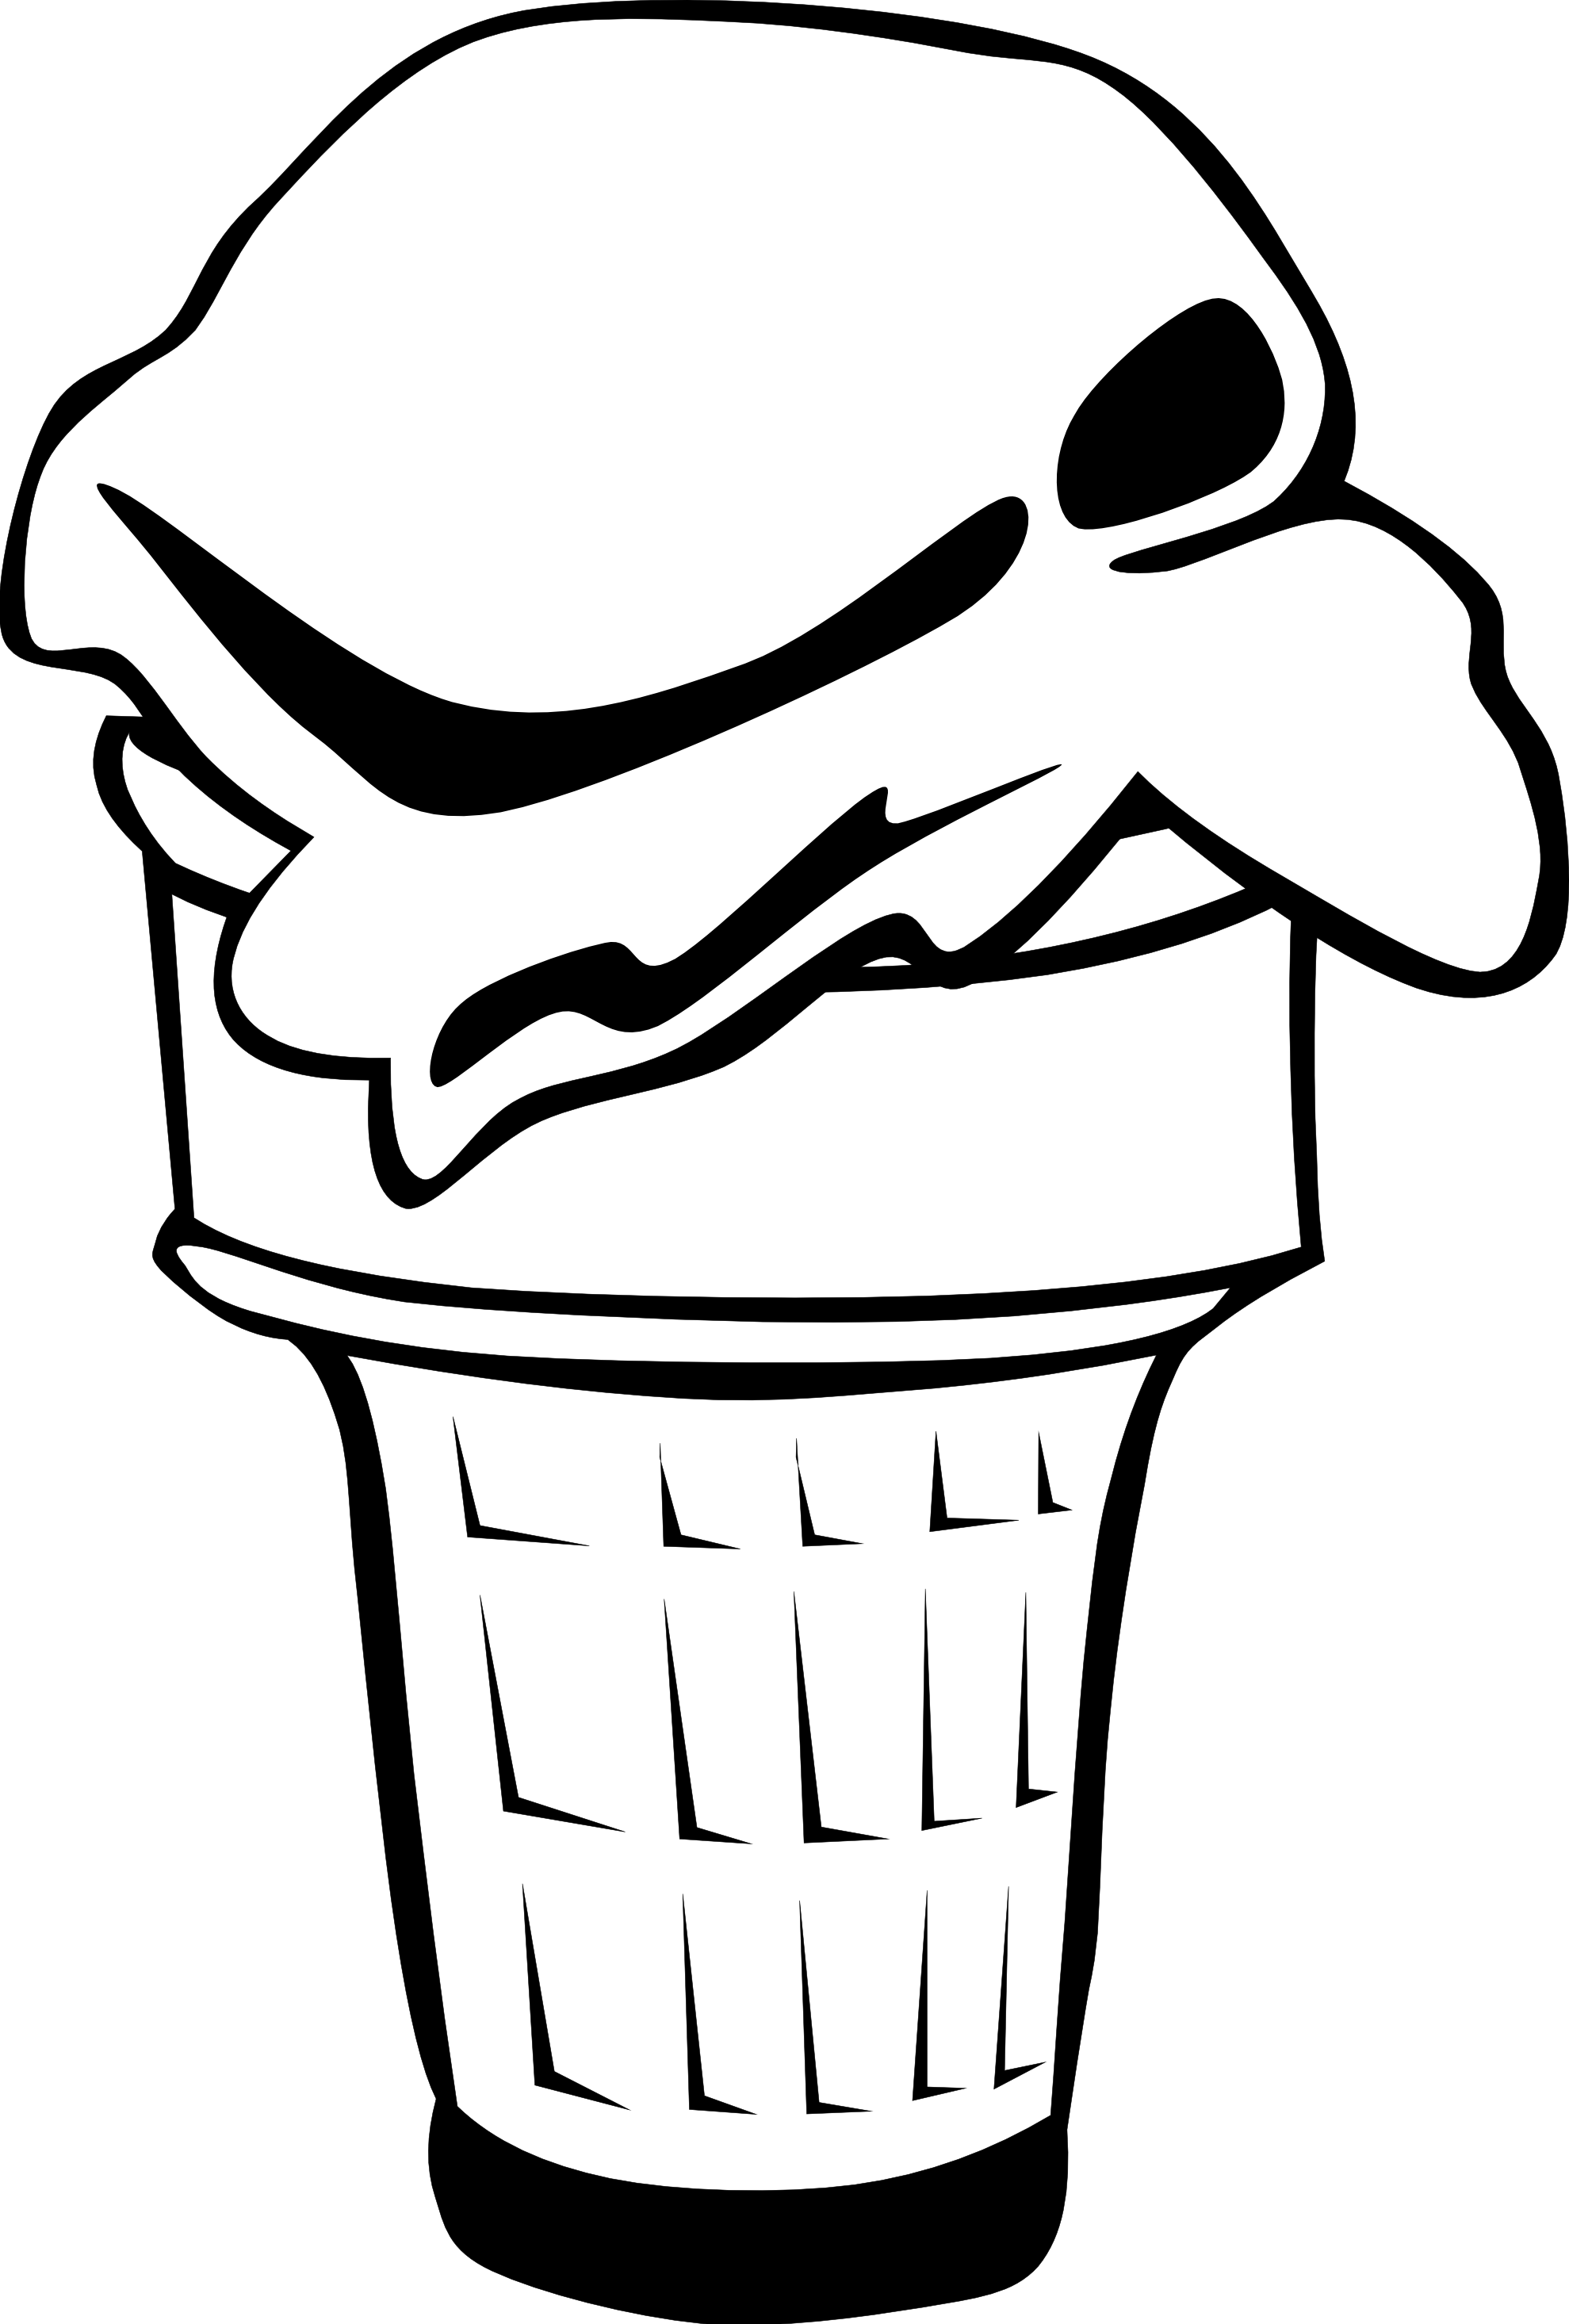 Ice cream cones ff. Yogurt clipart black and white